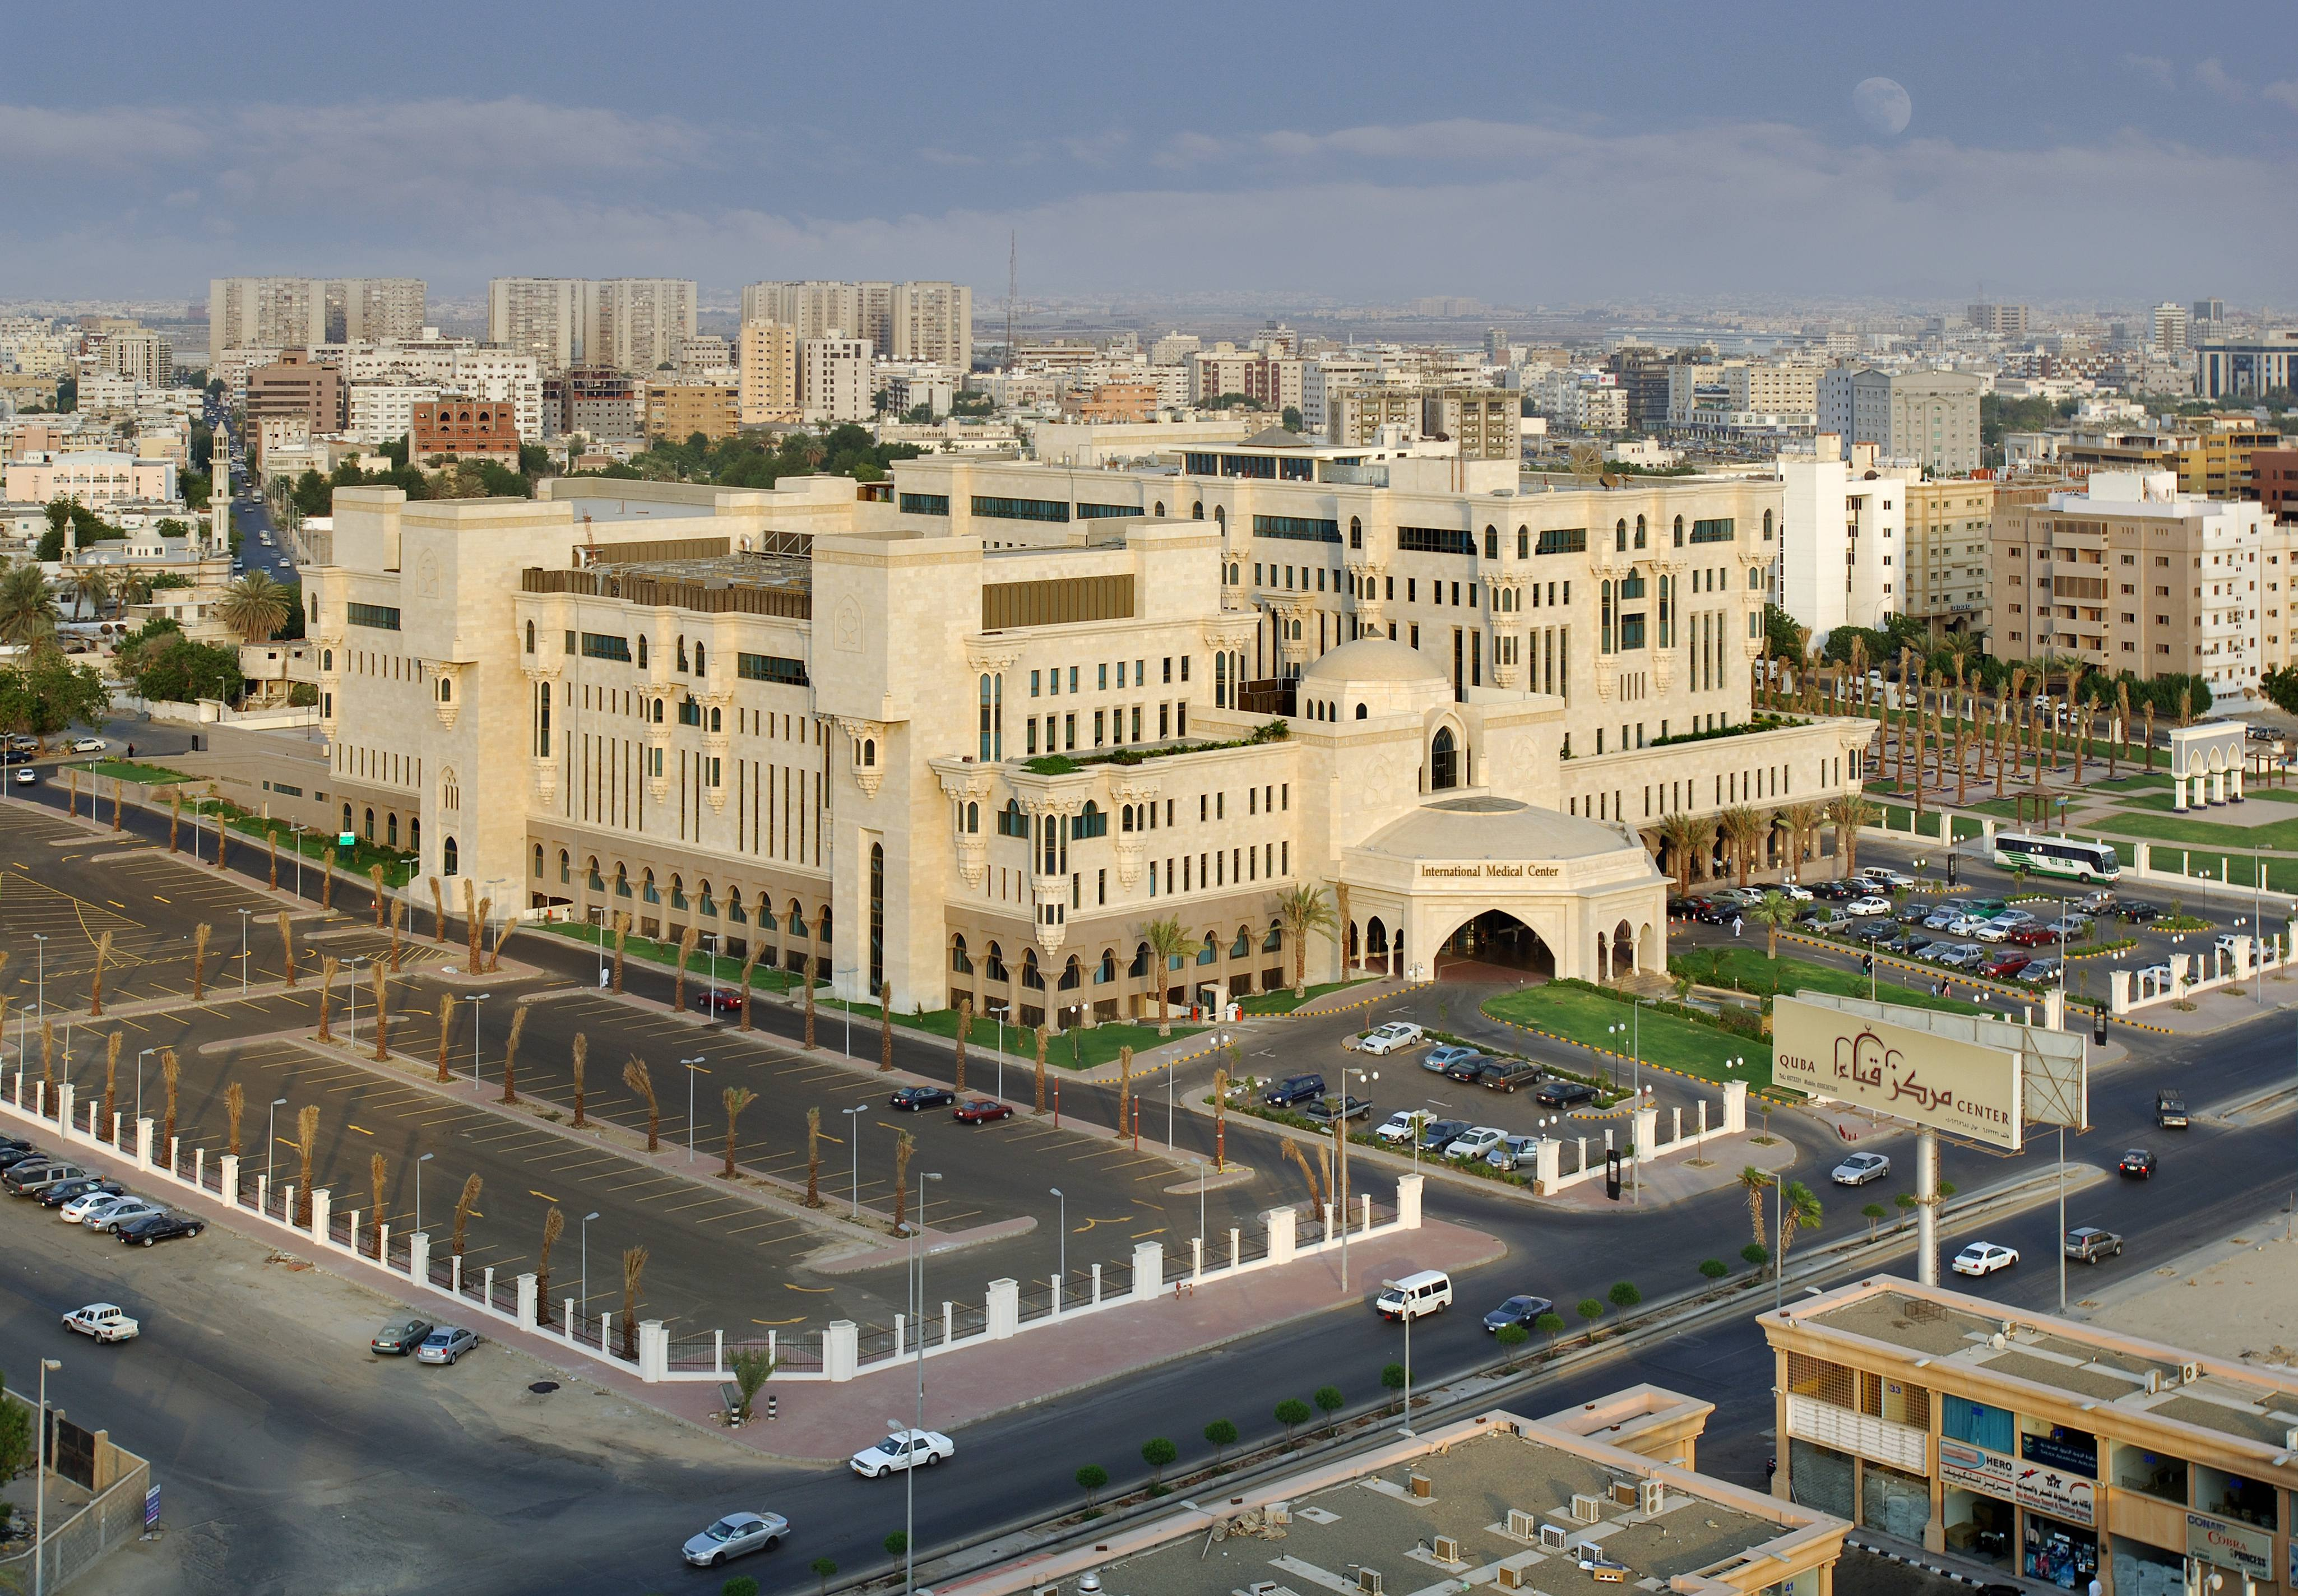 International Medical Center in Saudi Arabia